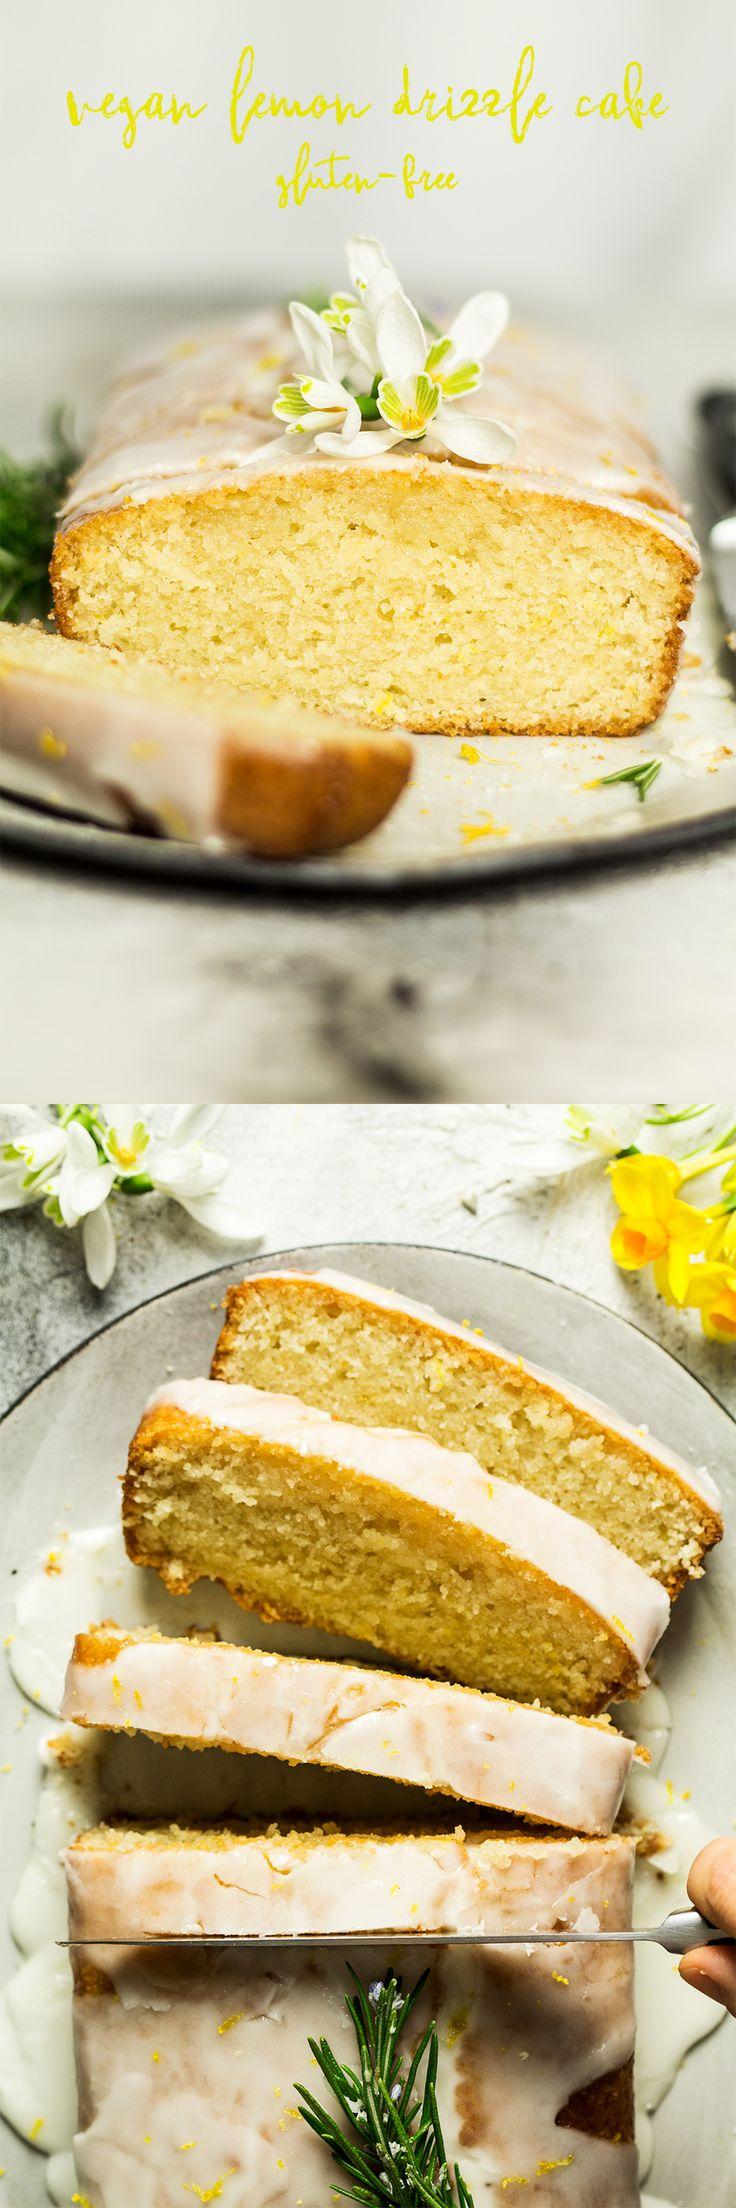 #cake #eggless #vegan #lemoncake #lemondrizzlecake #dairyfree #vegetarian #glutenfree